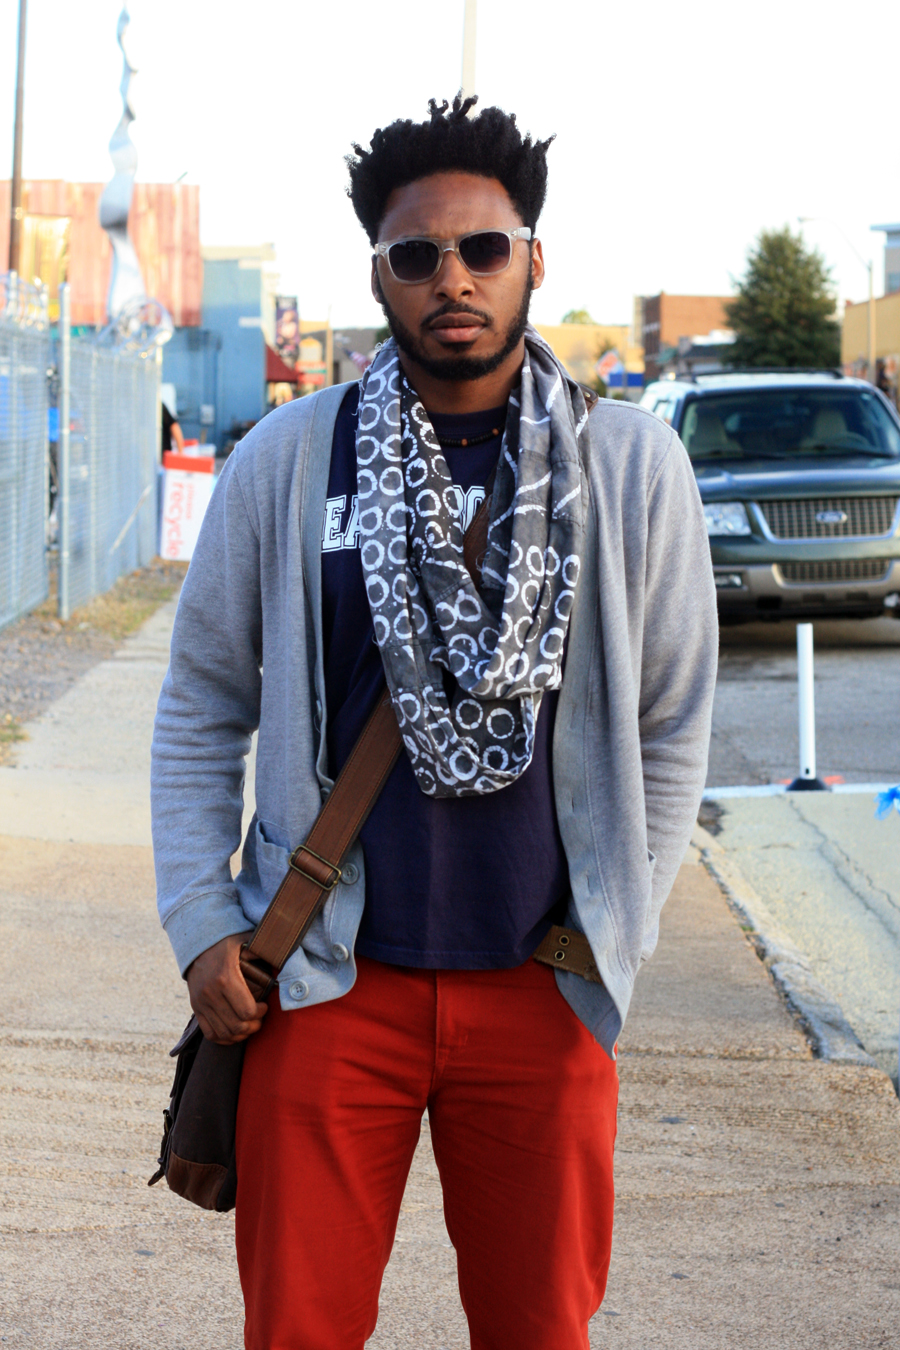 City-Style-KP-Fusion-Memphis-Brandon-Tolson-Cool-Artistik-Approach